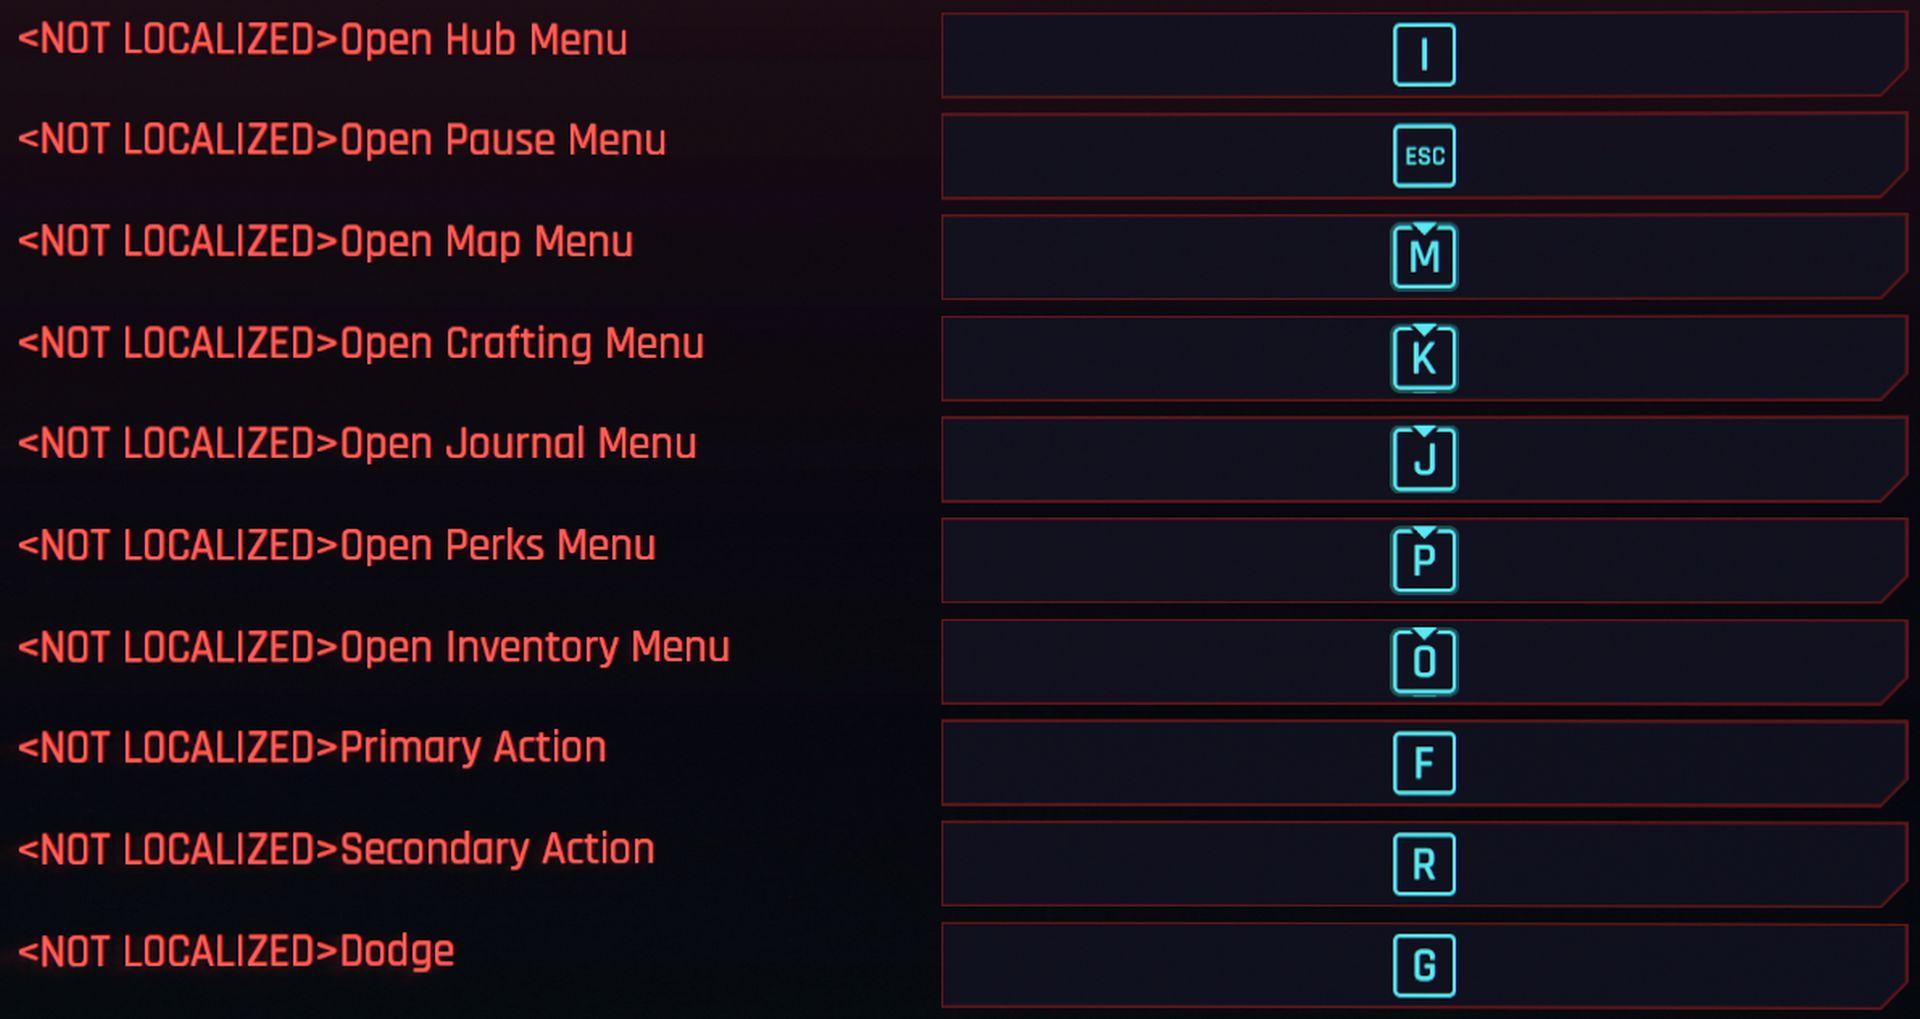 A screenshot of Cyberpunk 2077's expanded control settings menu